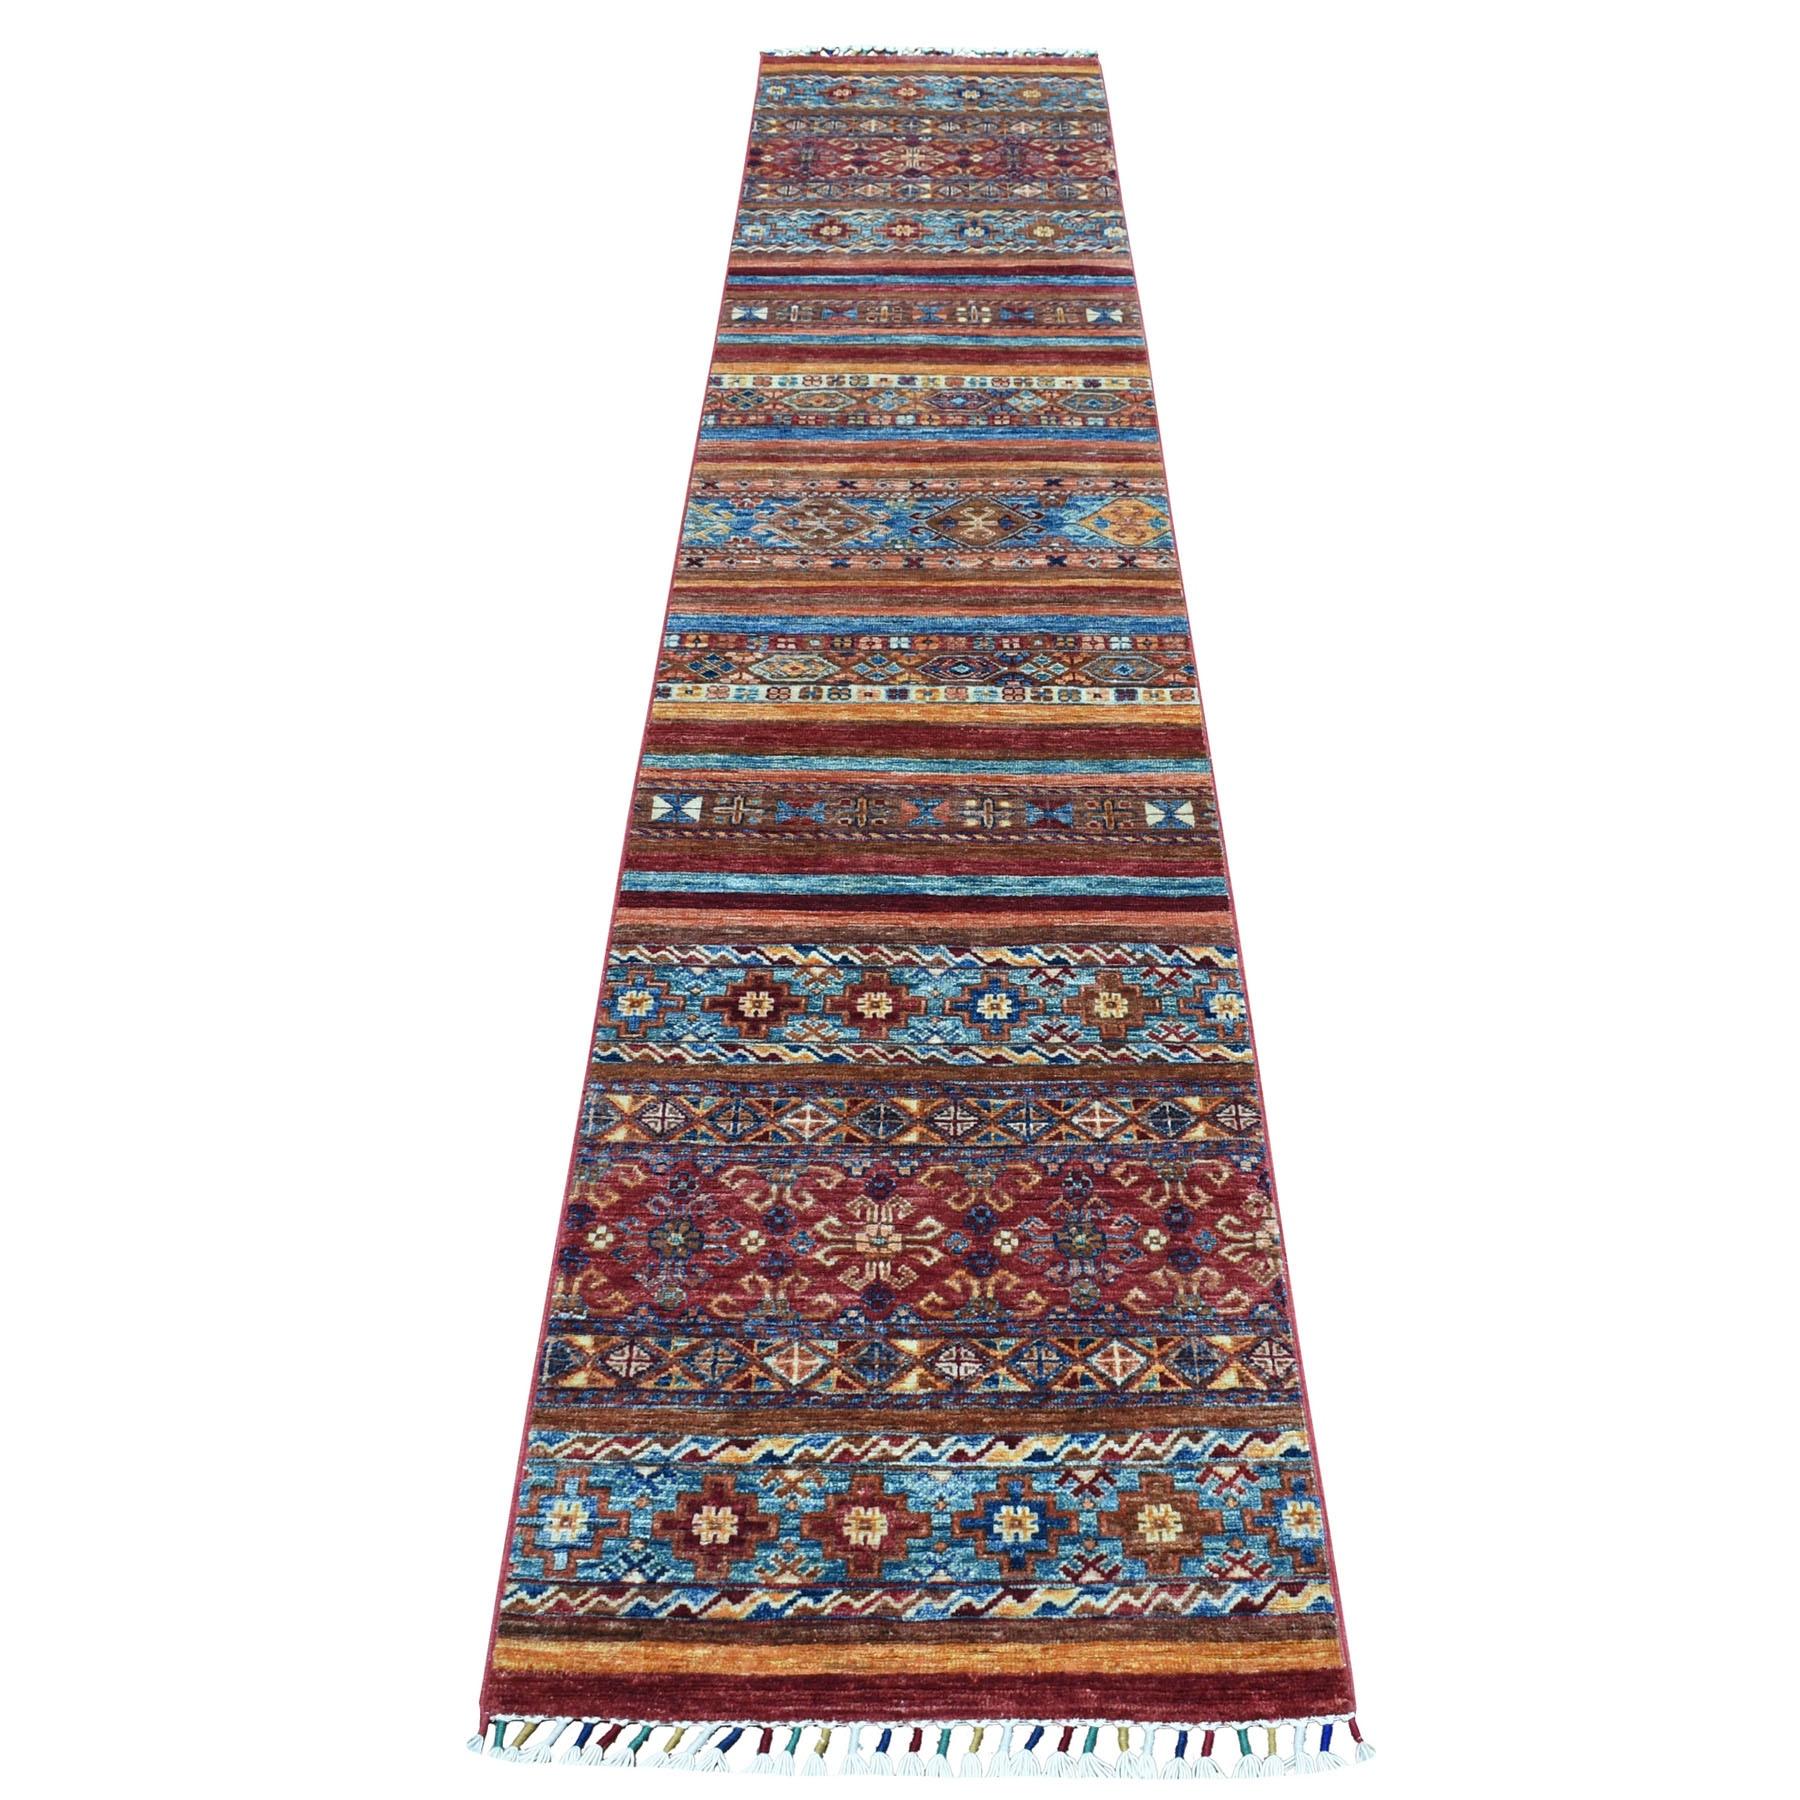 "2'X10'3"" Khorjin Design Colorful Narrow Runner Super Kazak Pure Wool Hand Knotted Oriental Rug moaebd7b"